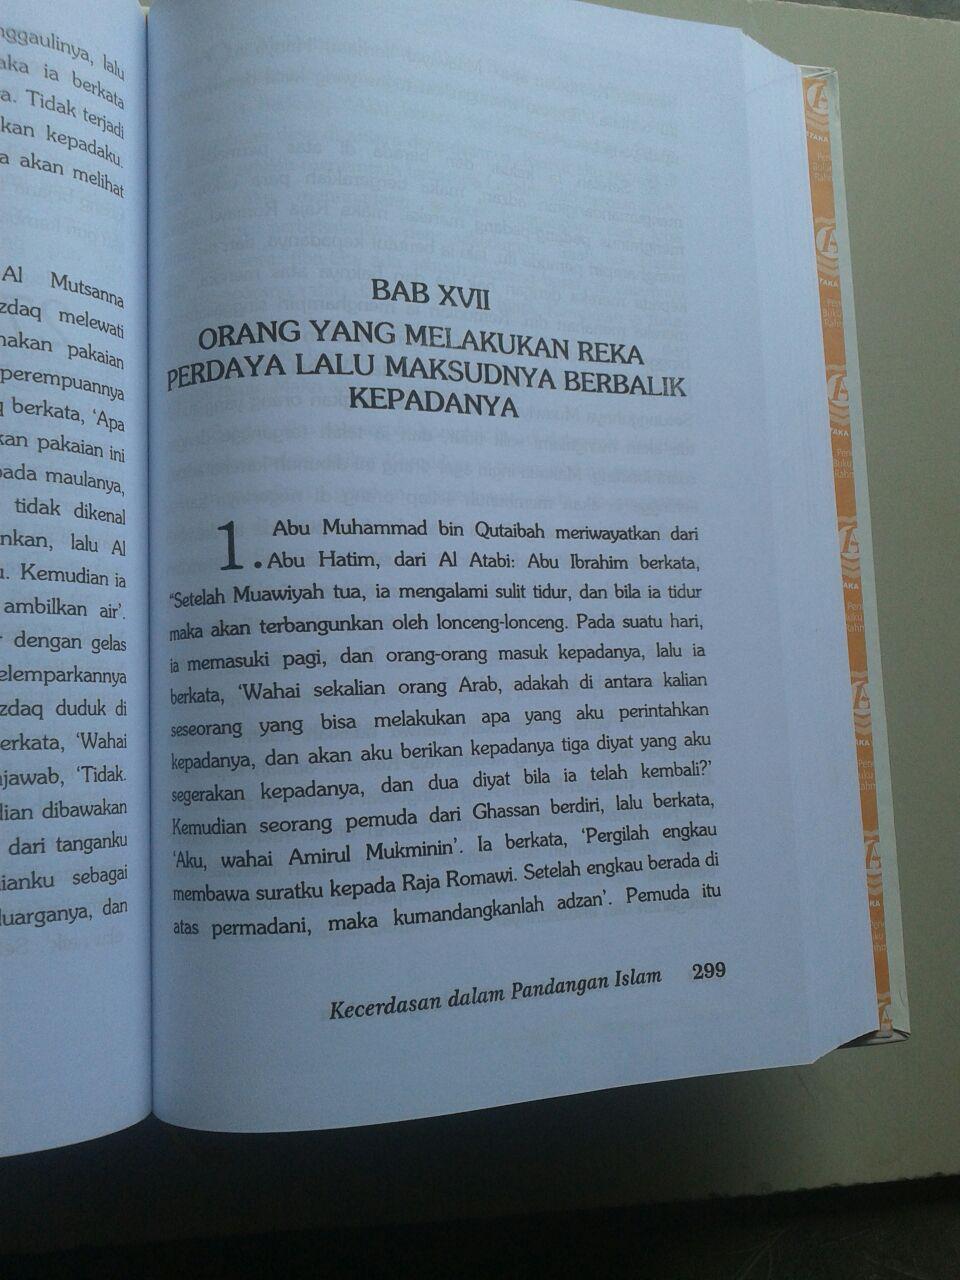 Buku Kecerdasan Dalam Pandangan Islam isi 3